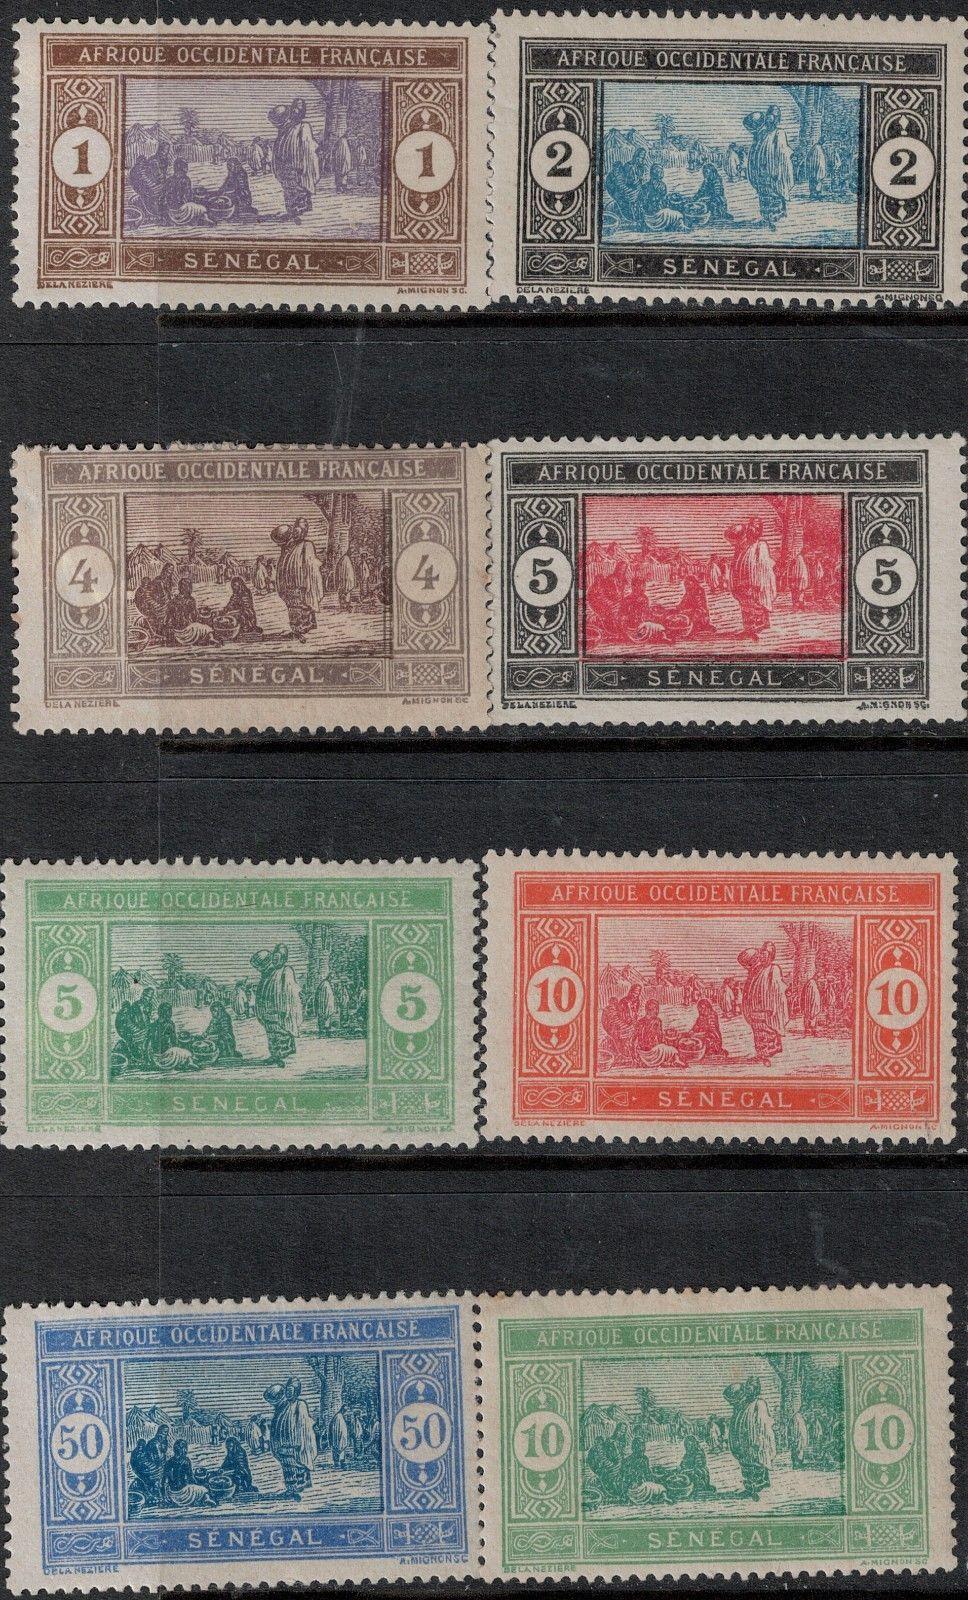 Barbados (until 1966) Stamps Barbados 1859 Sc 12 Used 3 Full Margins Scv $800.00